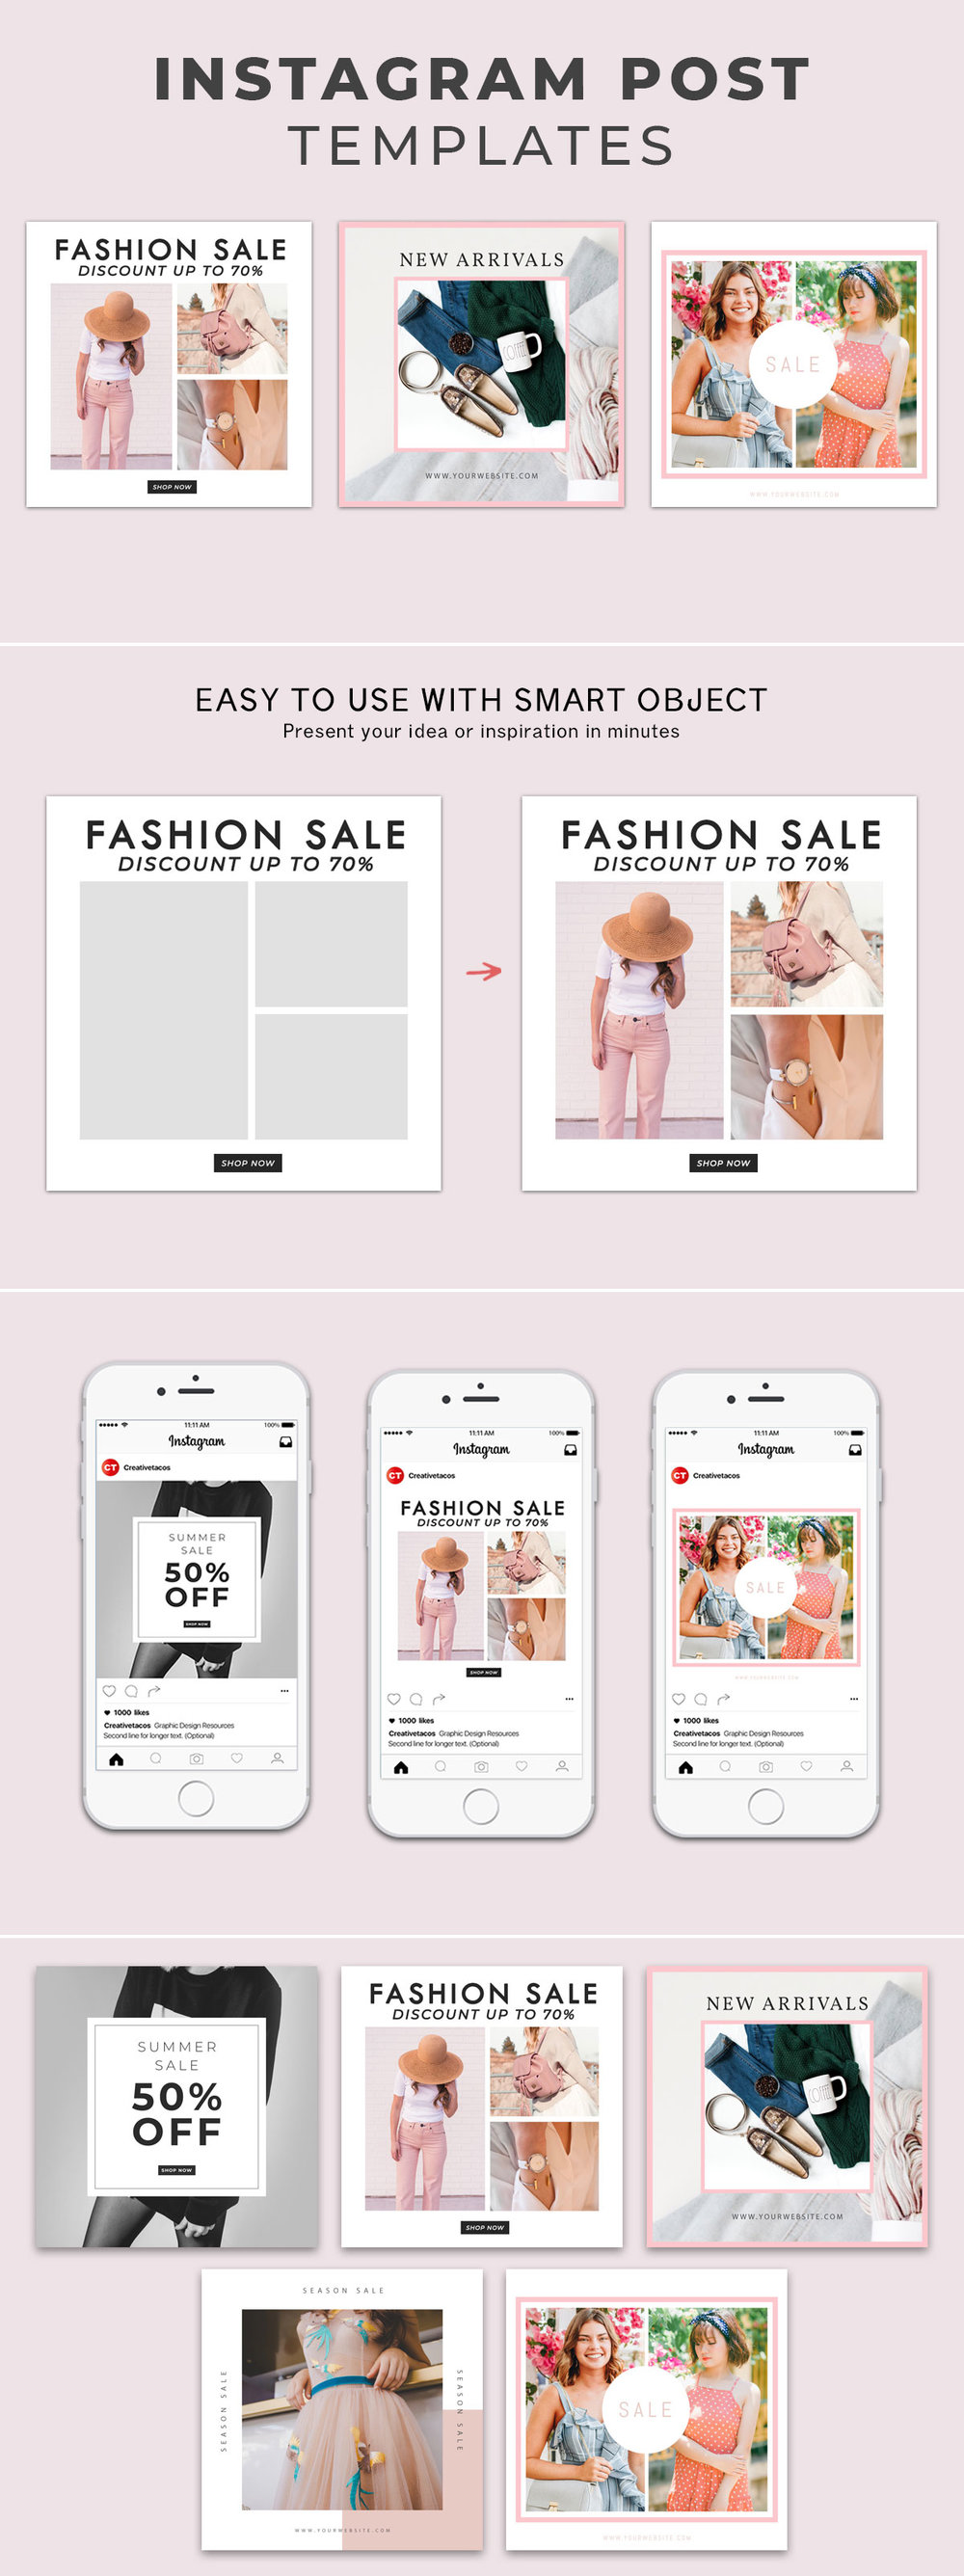 5 Free Fashion #Instagram #Social Media #Post #Templates Vol.1